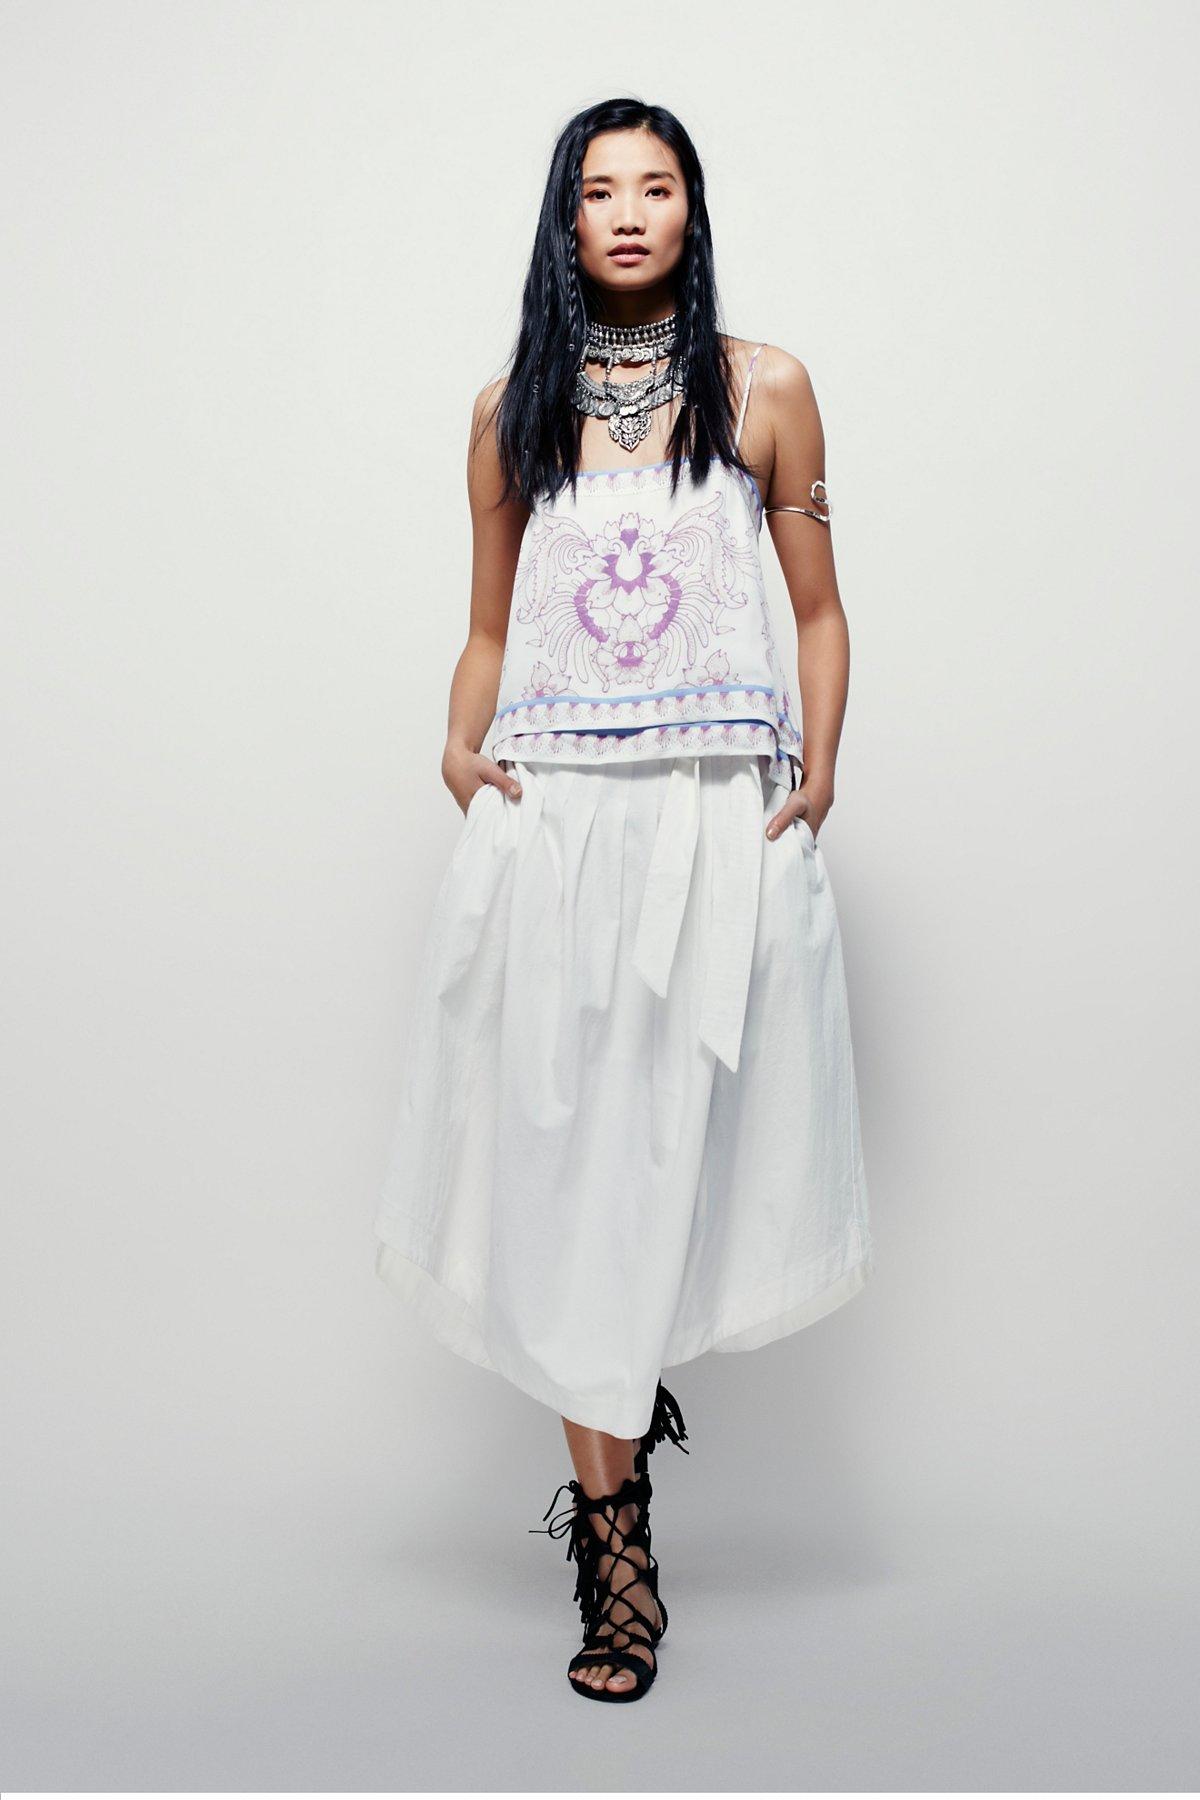 Riptide中长款半身裙